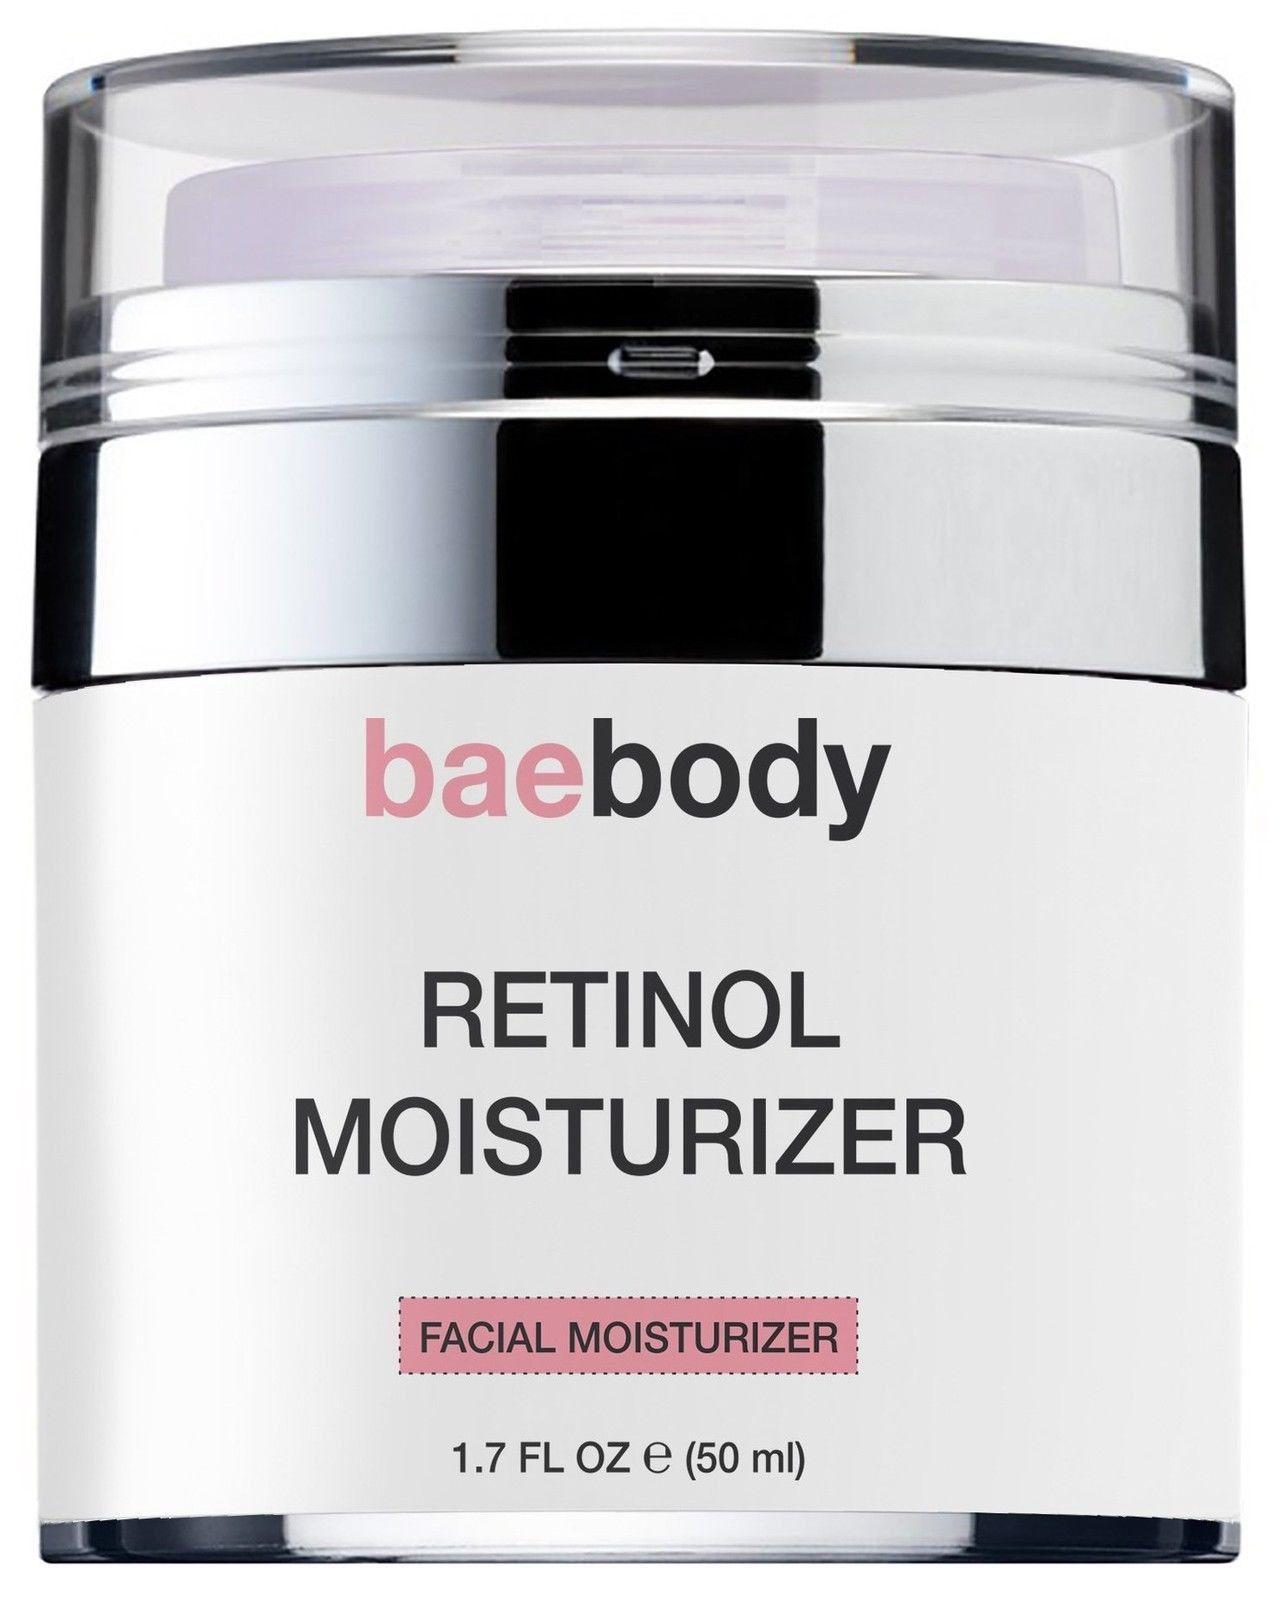 58ac6f409cf4 Baebody Retinol Moisturizer Cream for Face and Eye Area - With 2.5 ...